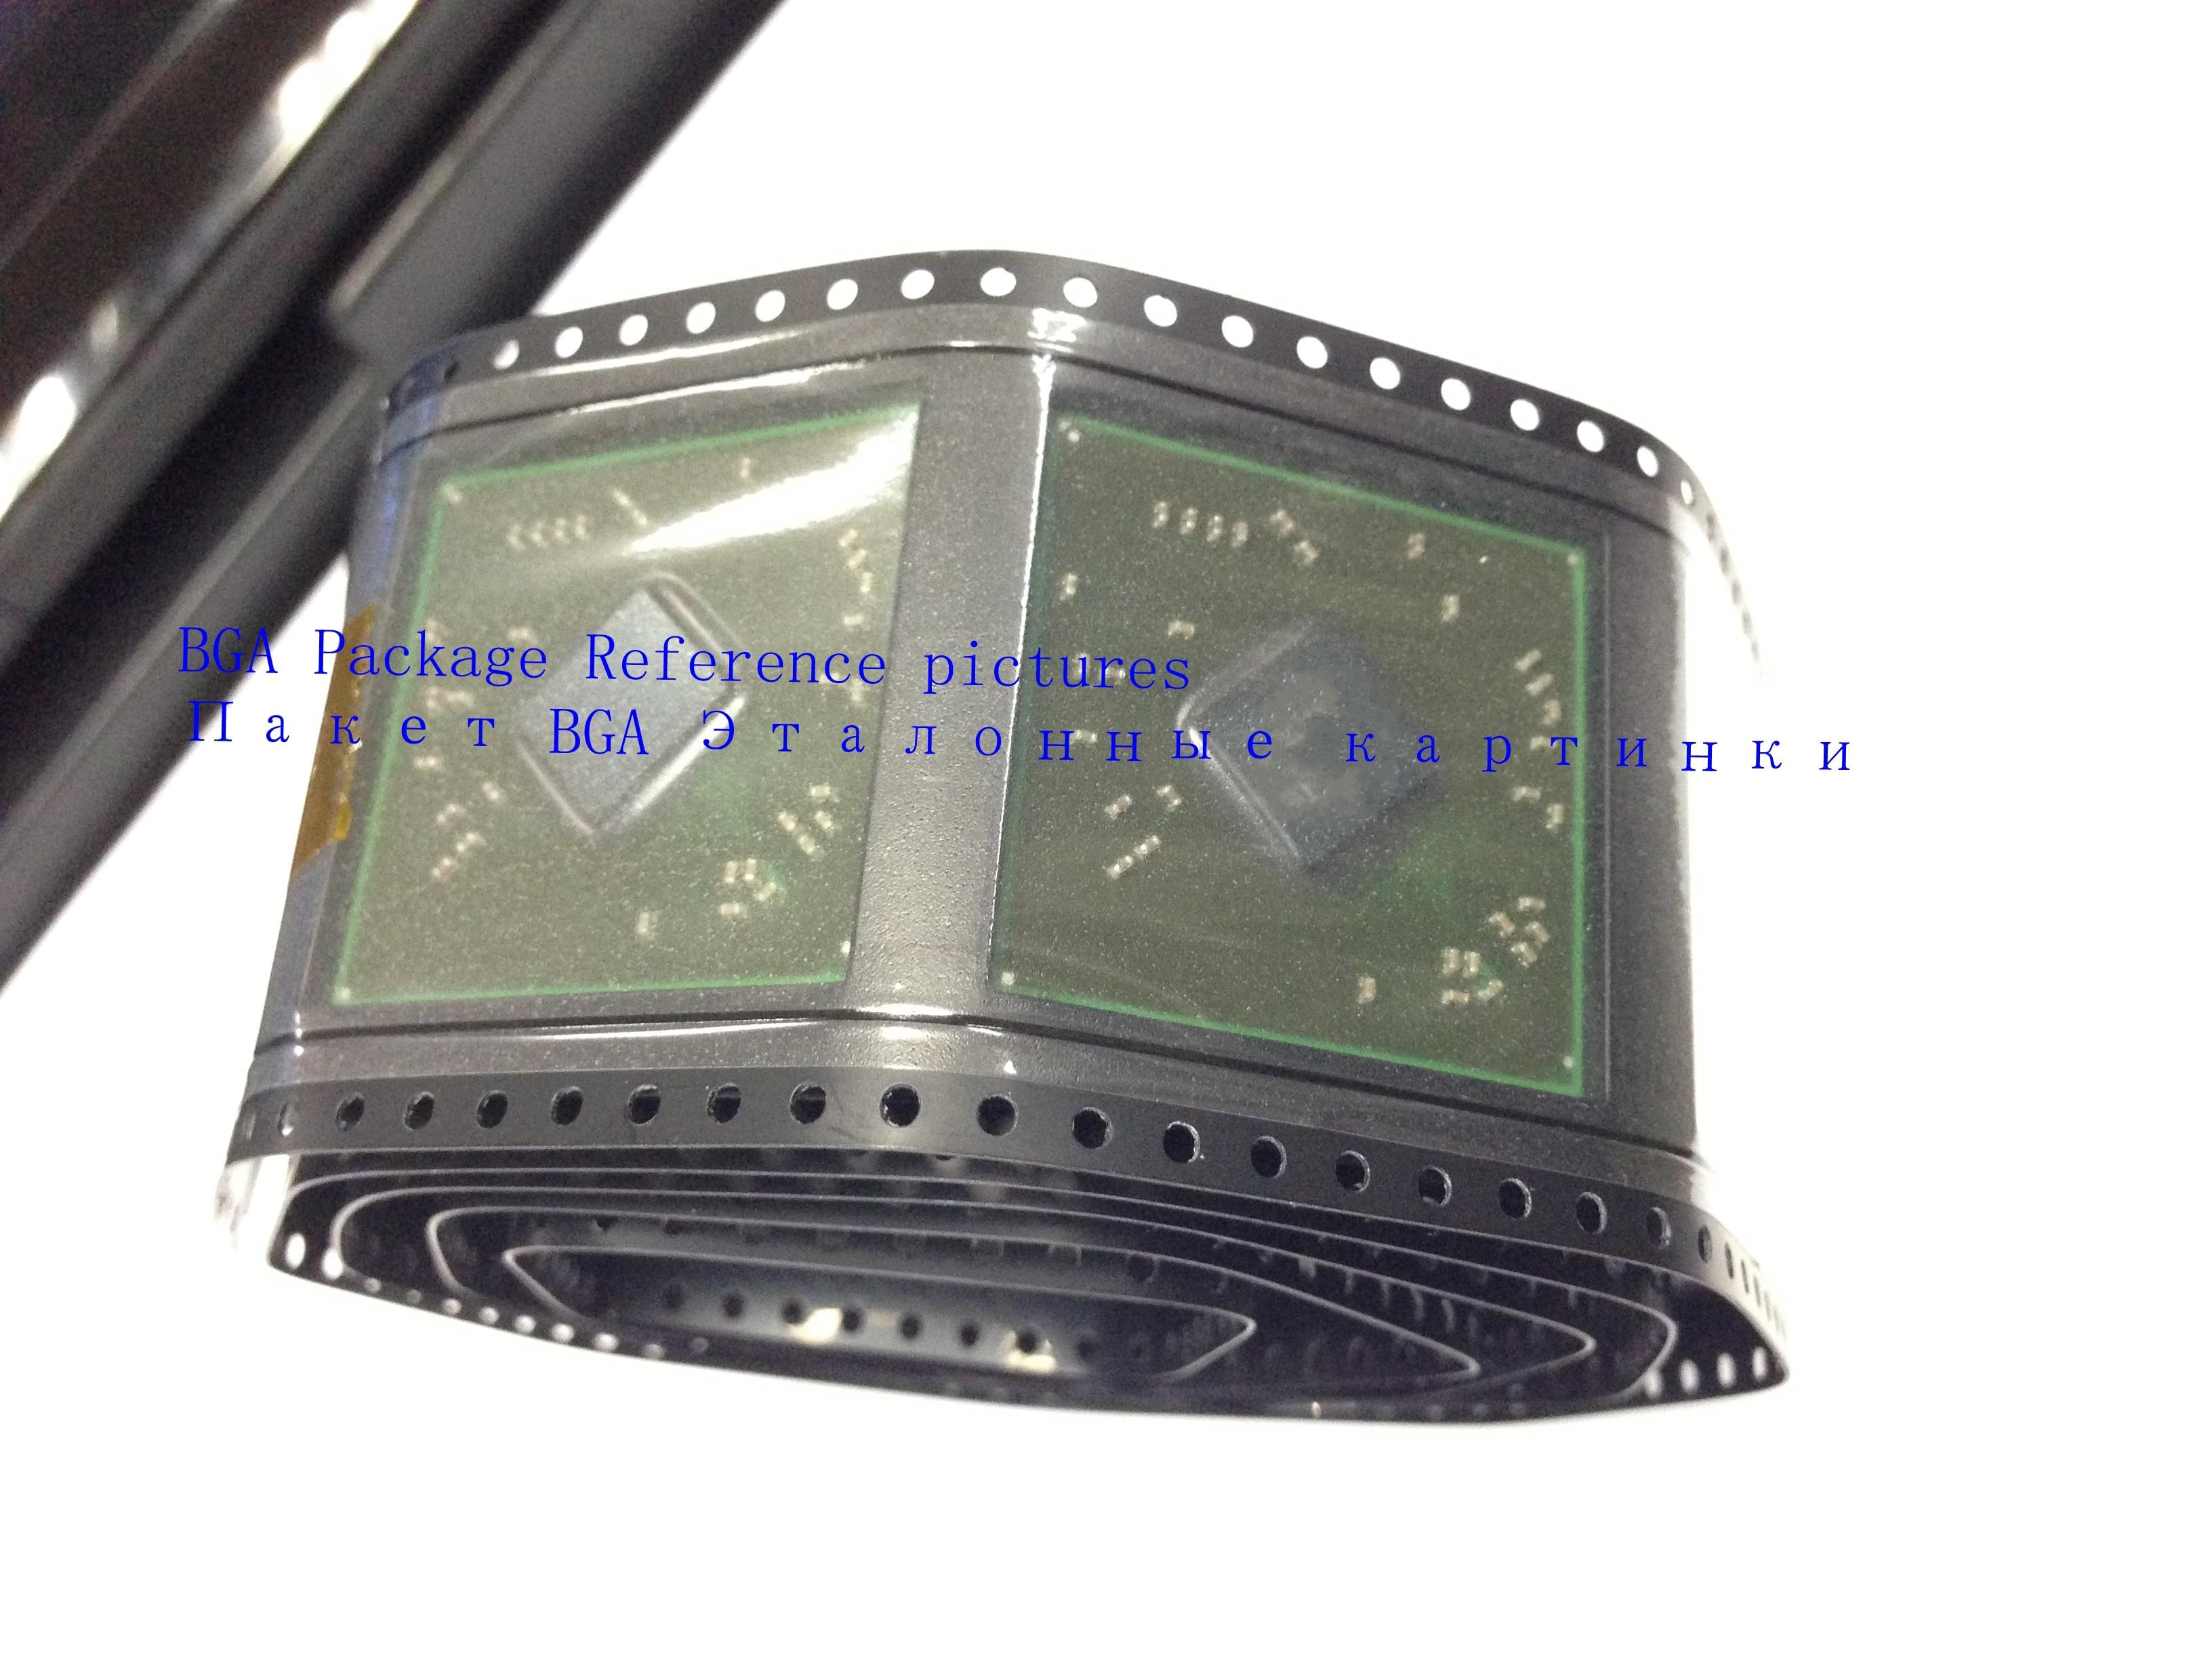 1pcs/lot 100% test very good product EM6110ITJ44JB bga chip reball with balls IC chips1pcs/lot 100% test very good product EM6110ITJ44JB bga chip reball with balls IC chips